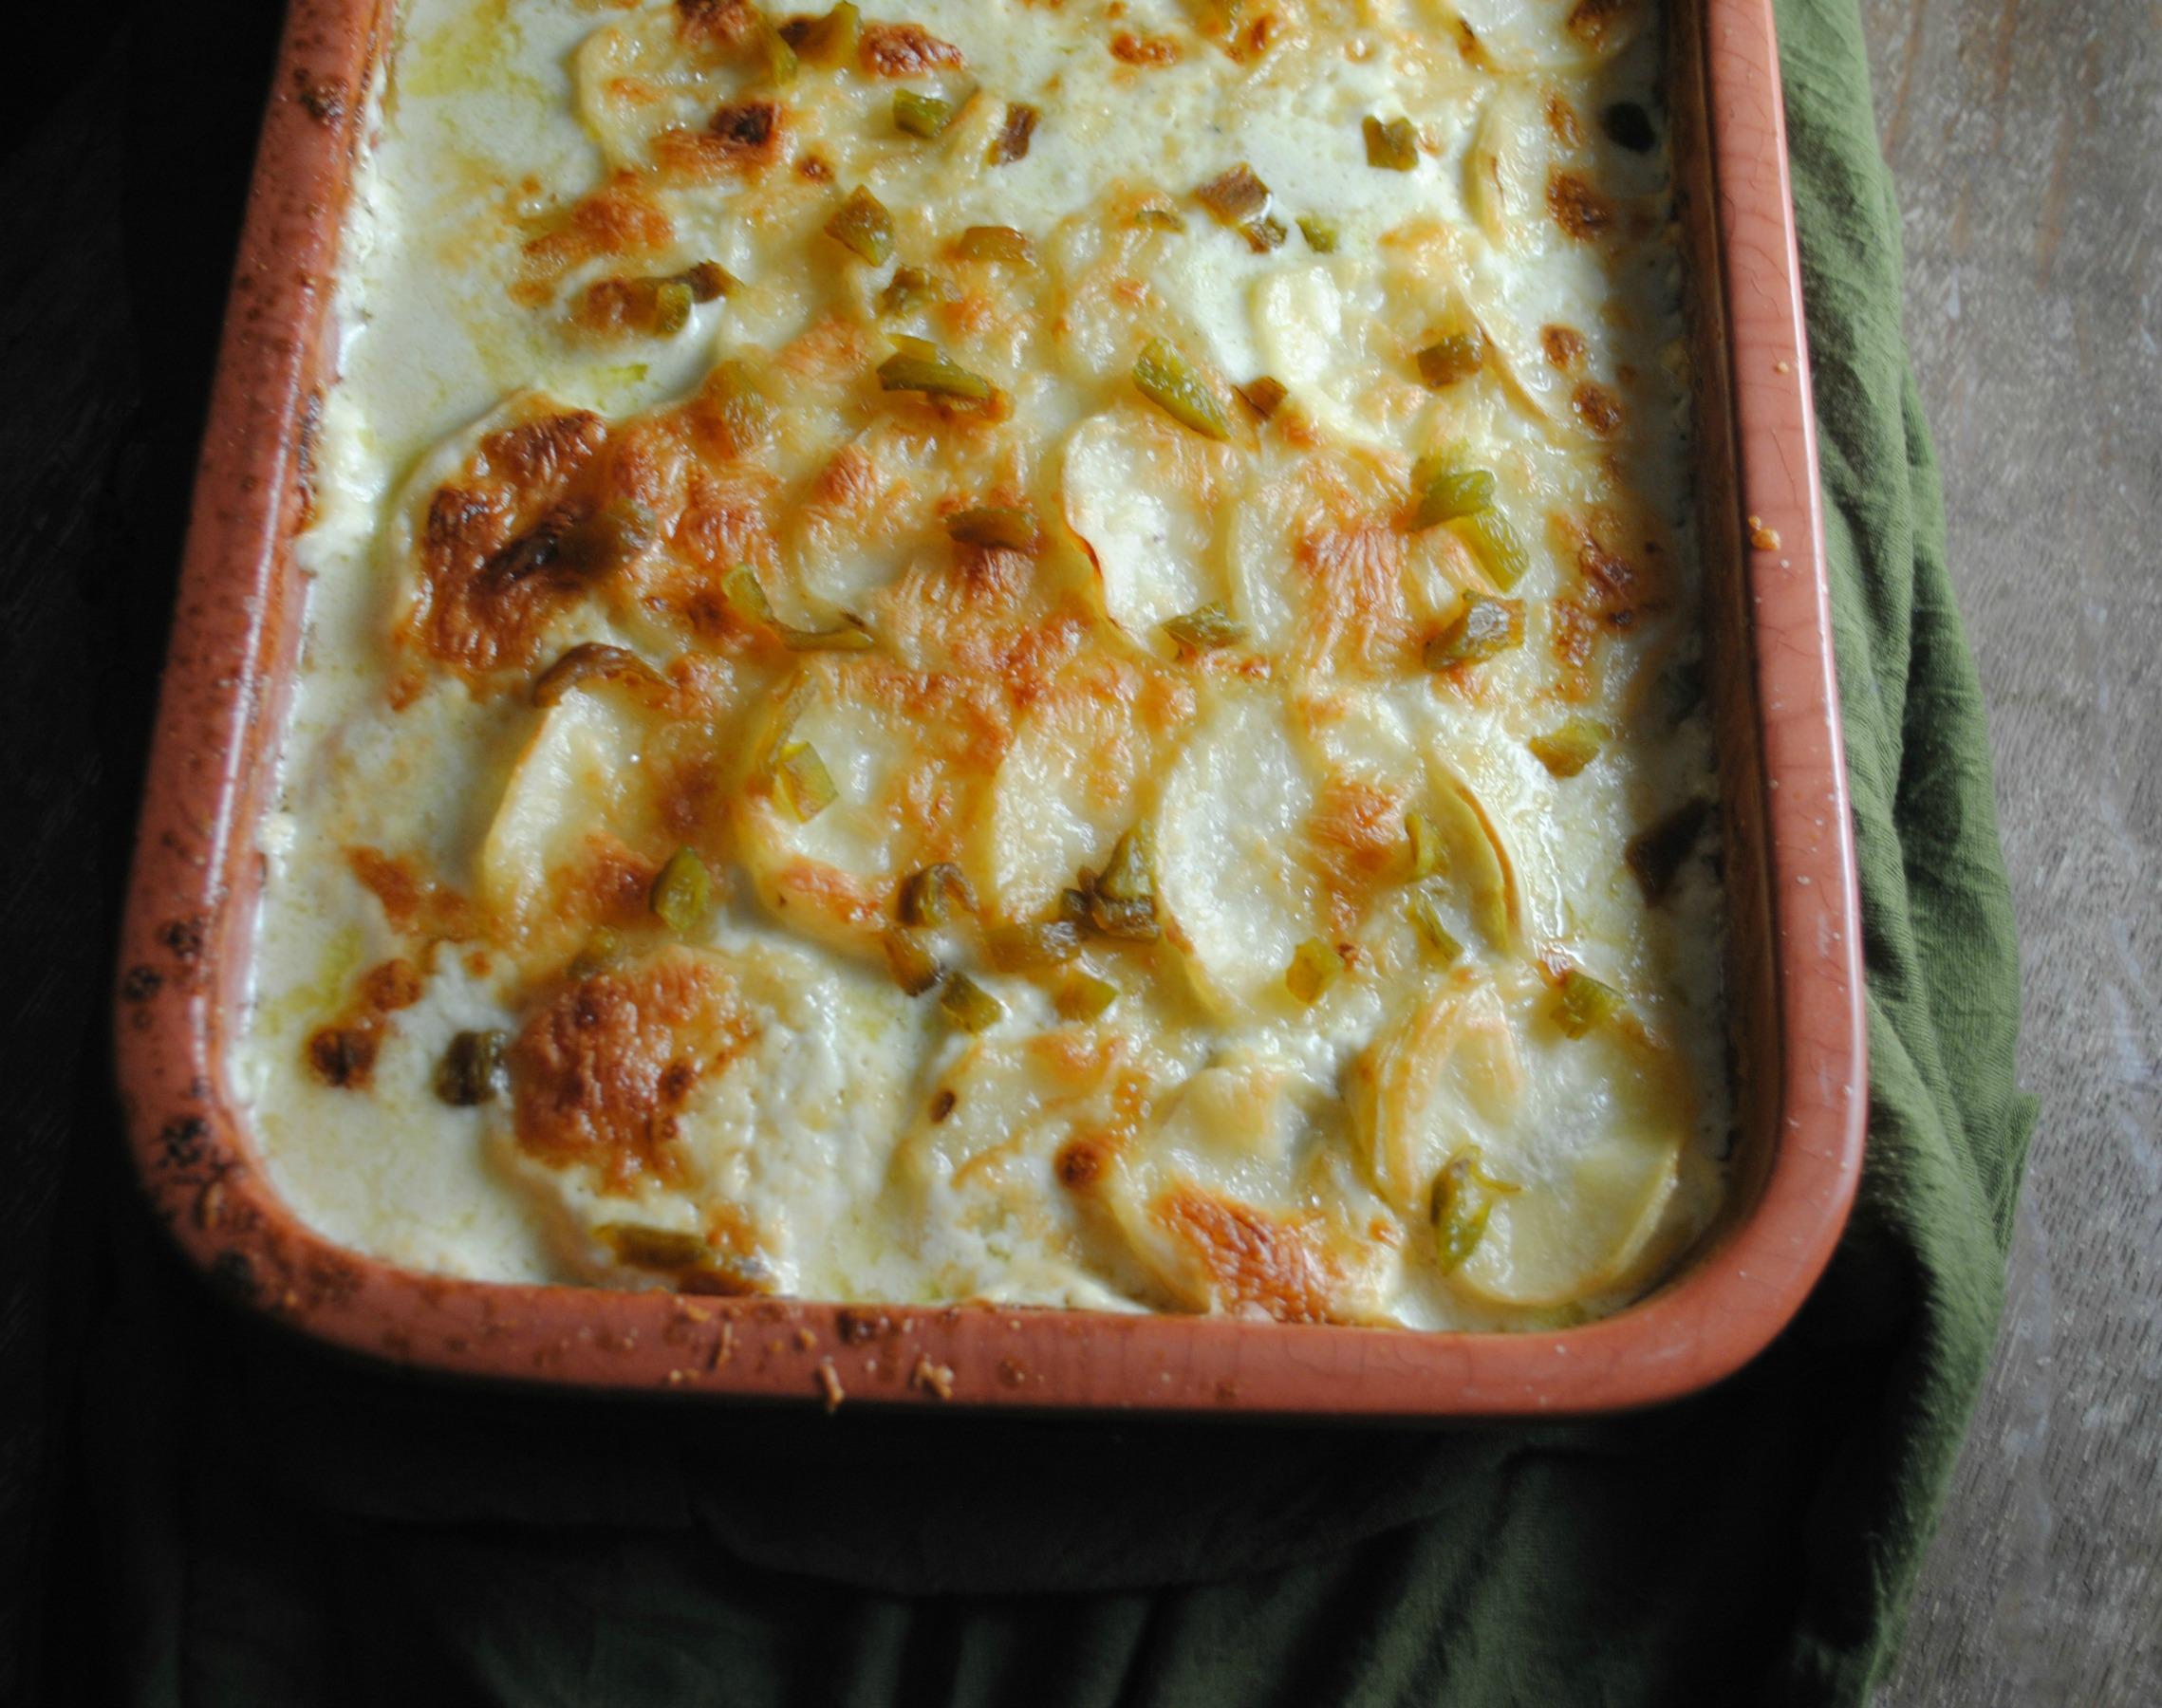 scalloped-roasted-poblano-potatoes-VianneyRodriguez-sweetlifebake